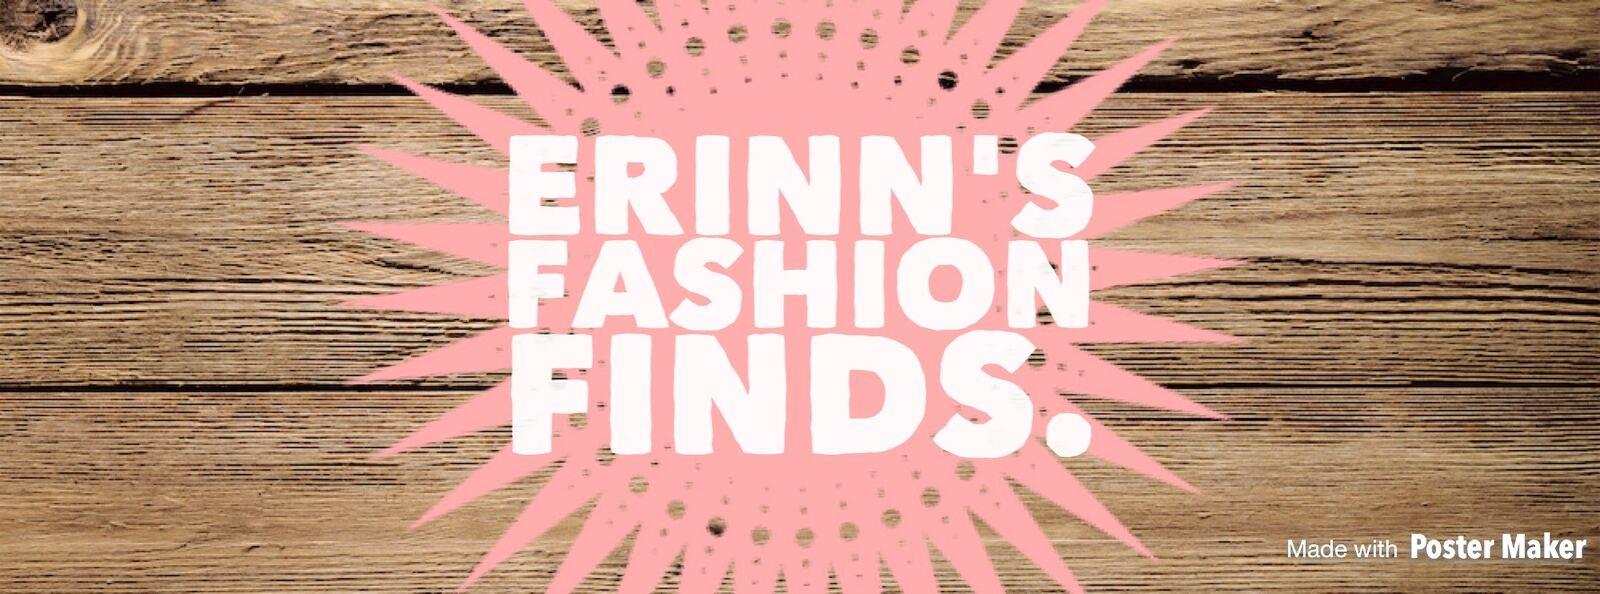 Erinn's Fashion Finds